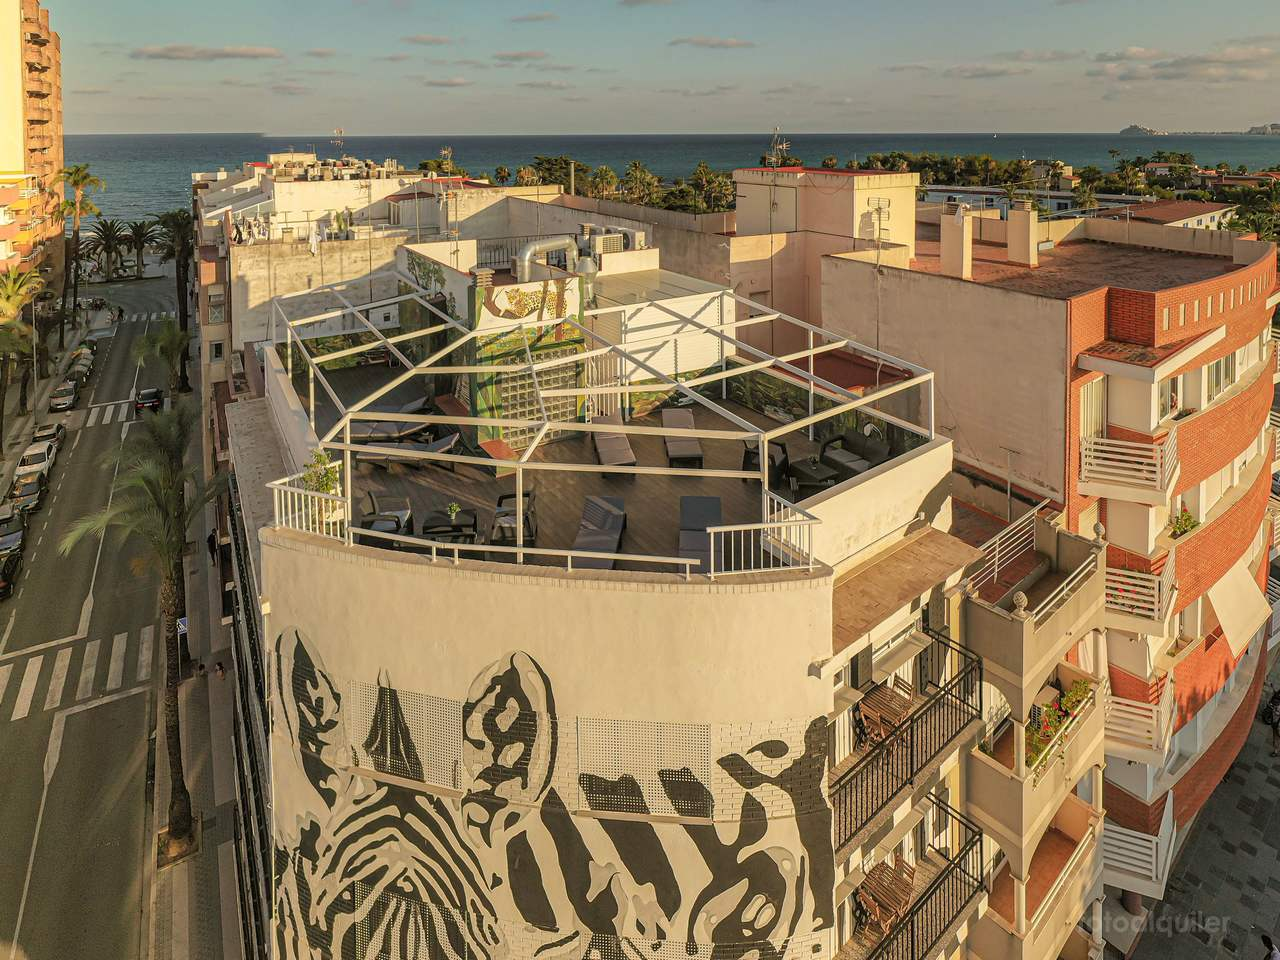 Apartamentos Las Cebras, apartamentos turísticos en Benicarló, Castellón